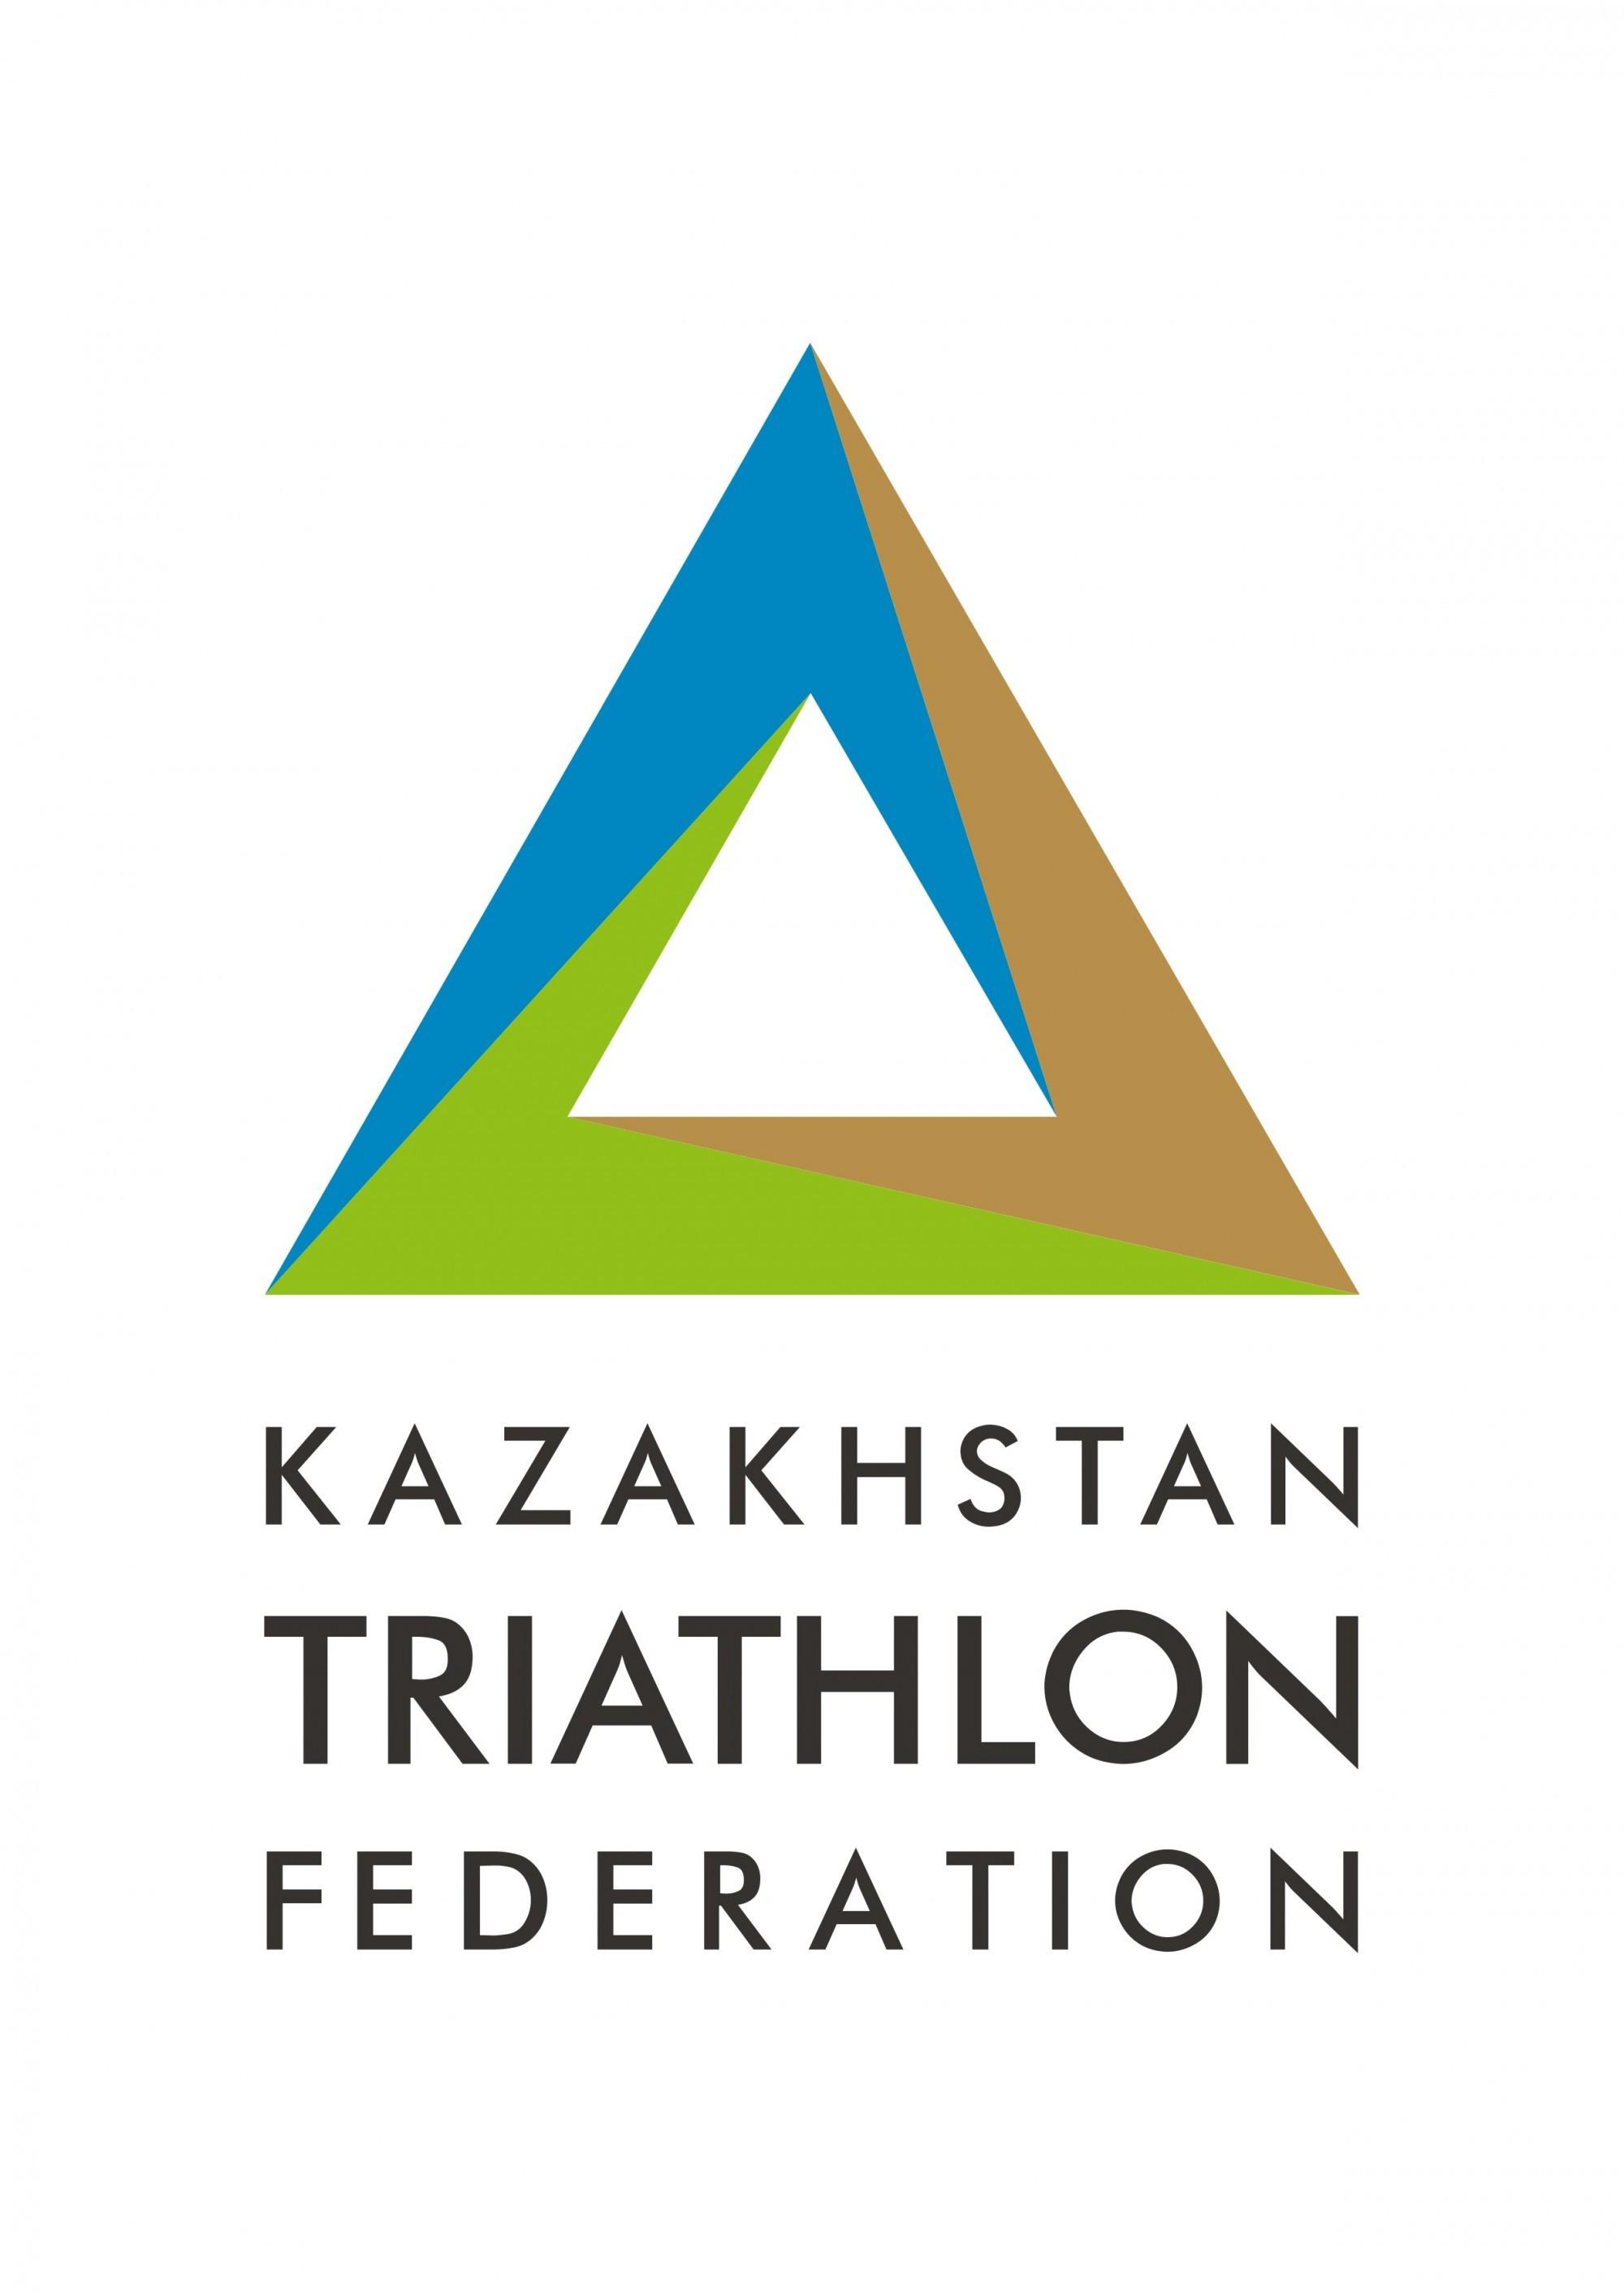 Kazakhstan Triathlon Federation logo